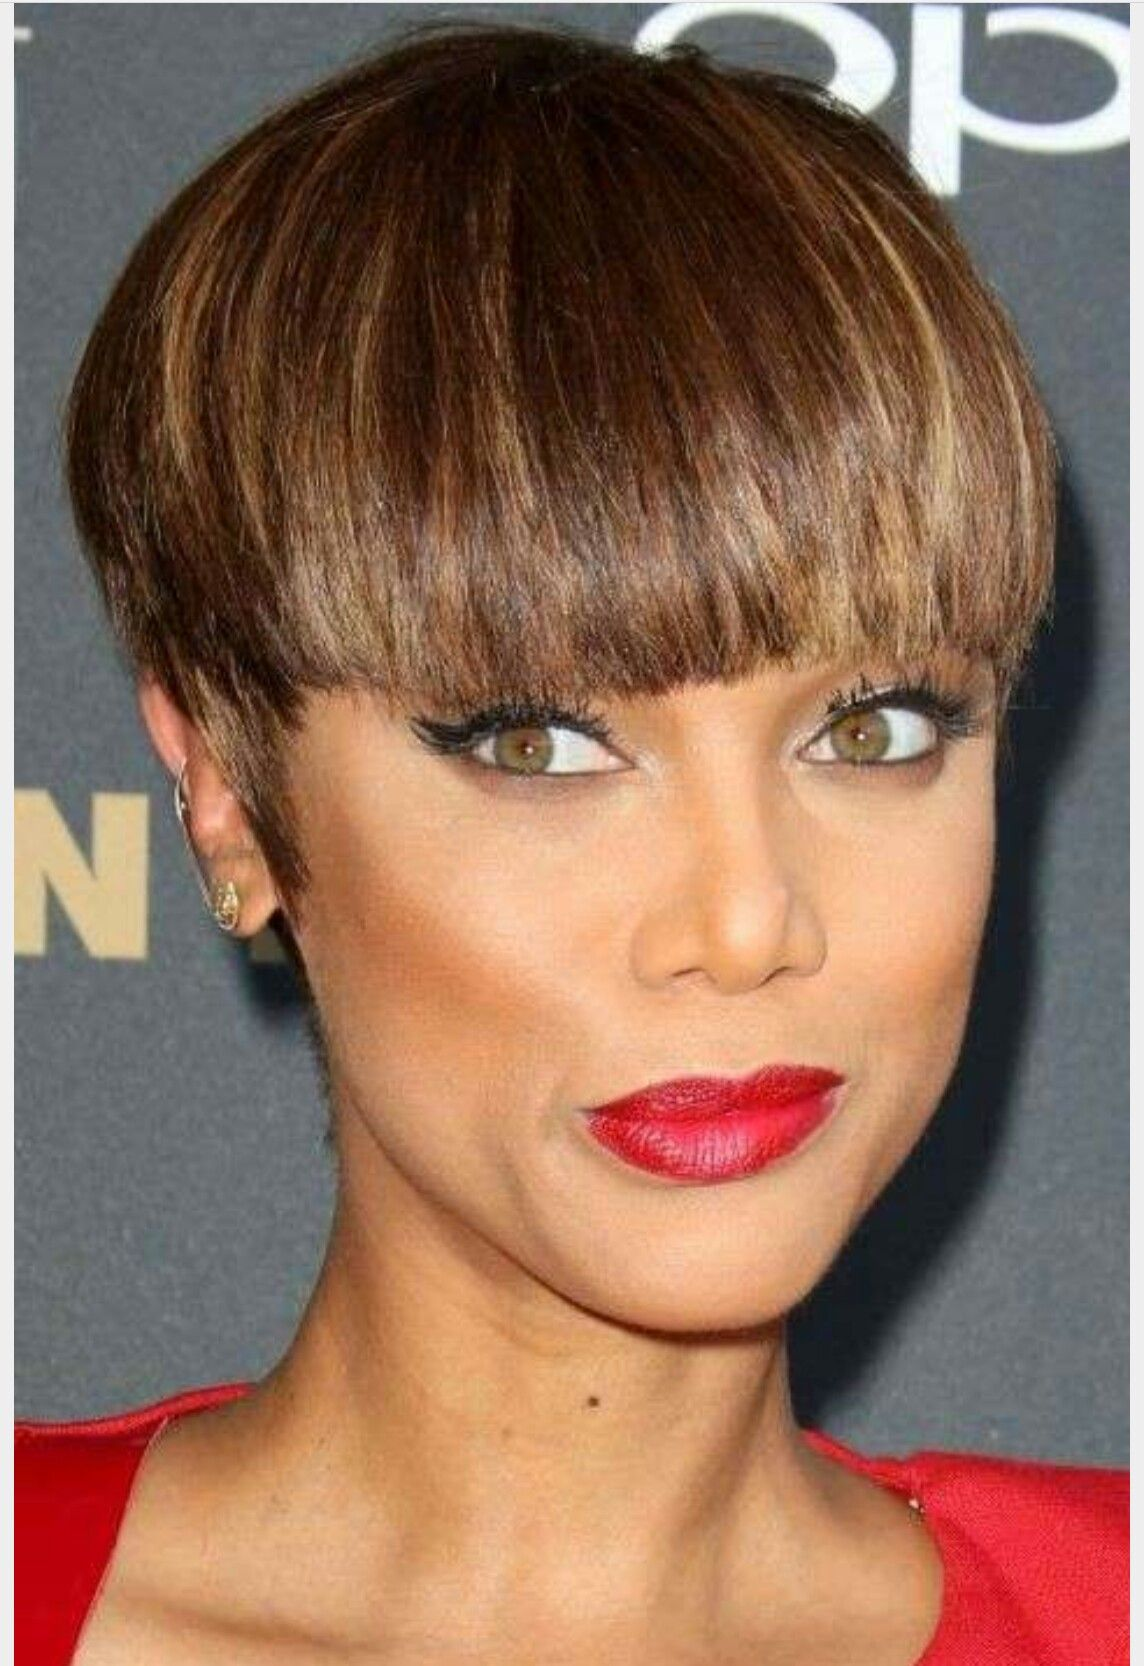 www.TryHTGE.com}} Try Hair Trigger Growth Elixir